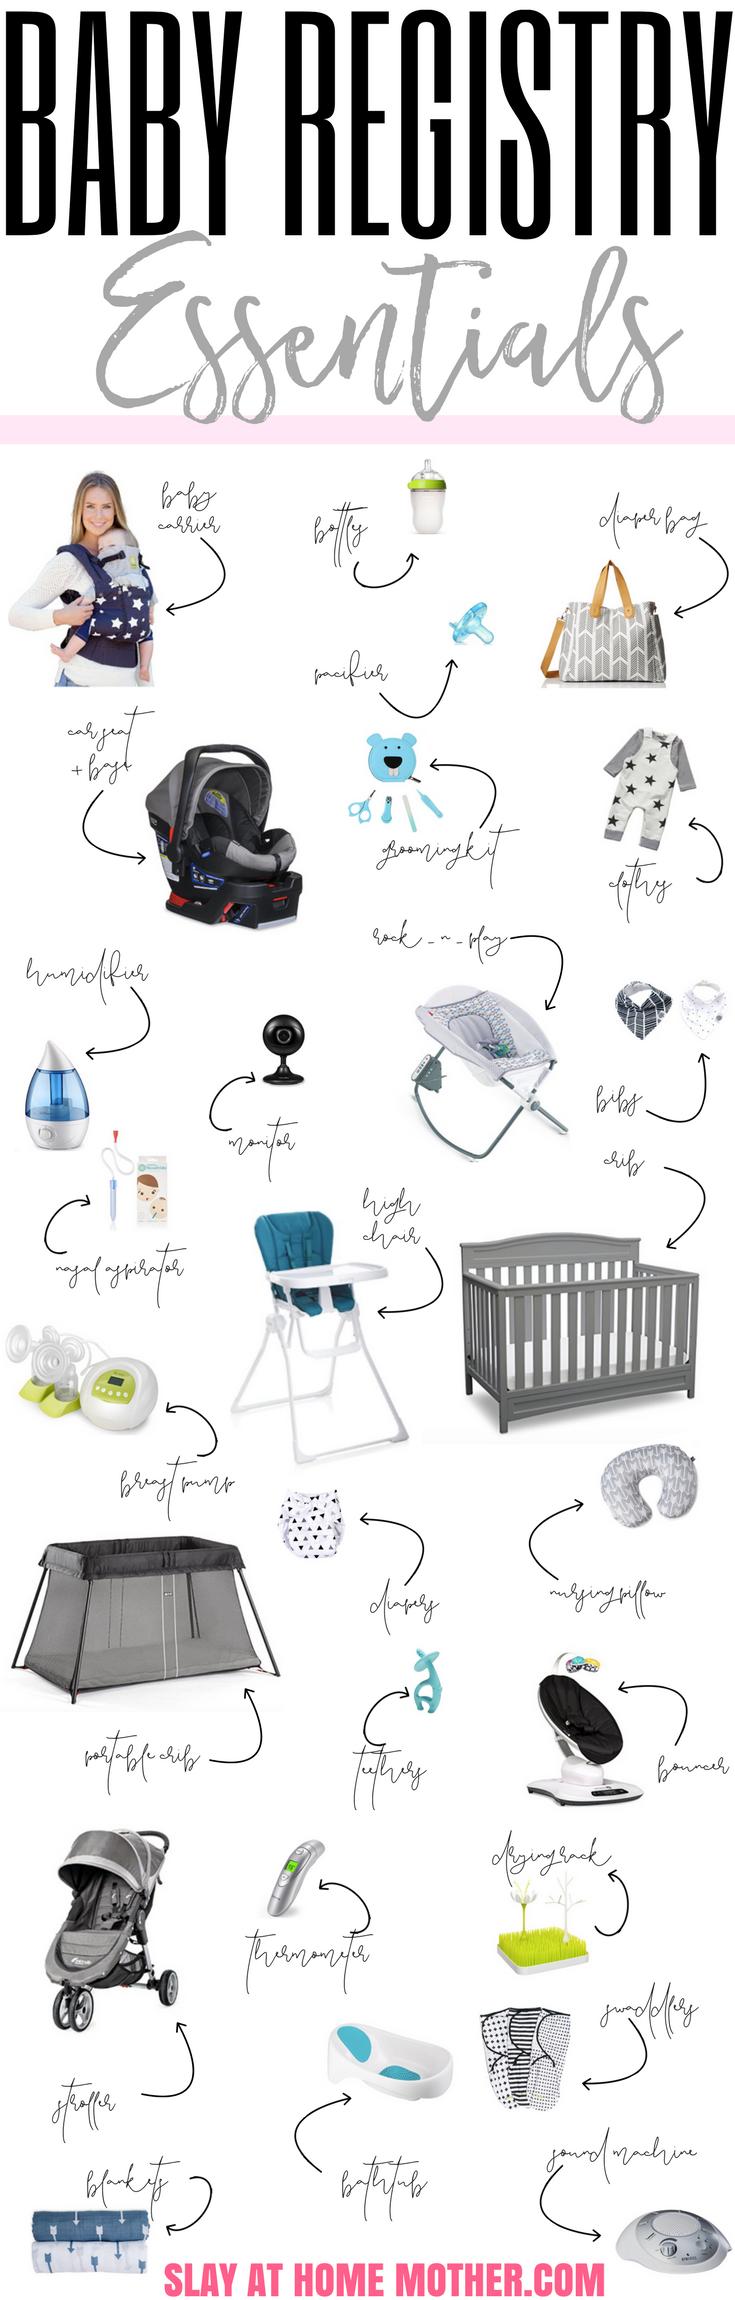 BABY REGISTRY ESSENTIALS (+ Free Checklist!) - #newbornessentials #babyregistry #babymusthaves #mommusthaves #registry #freechecklist . SlayAtHomeMother.com